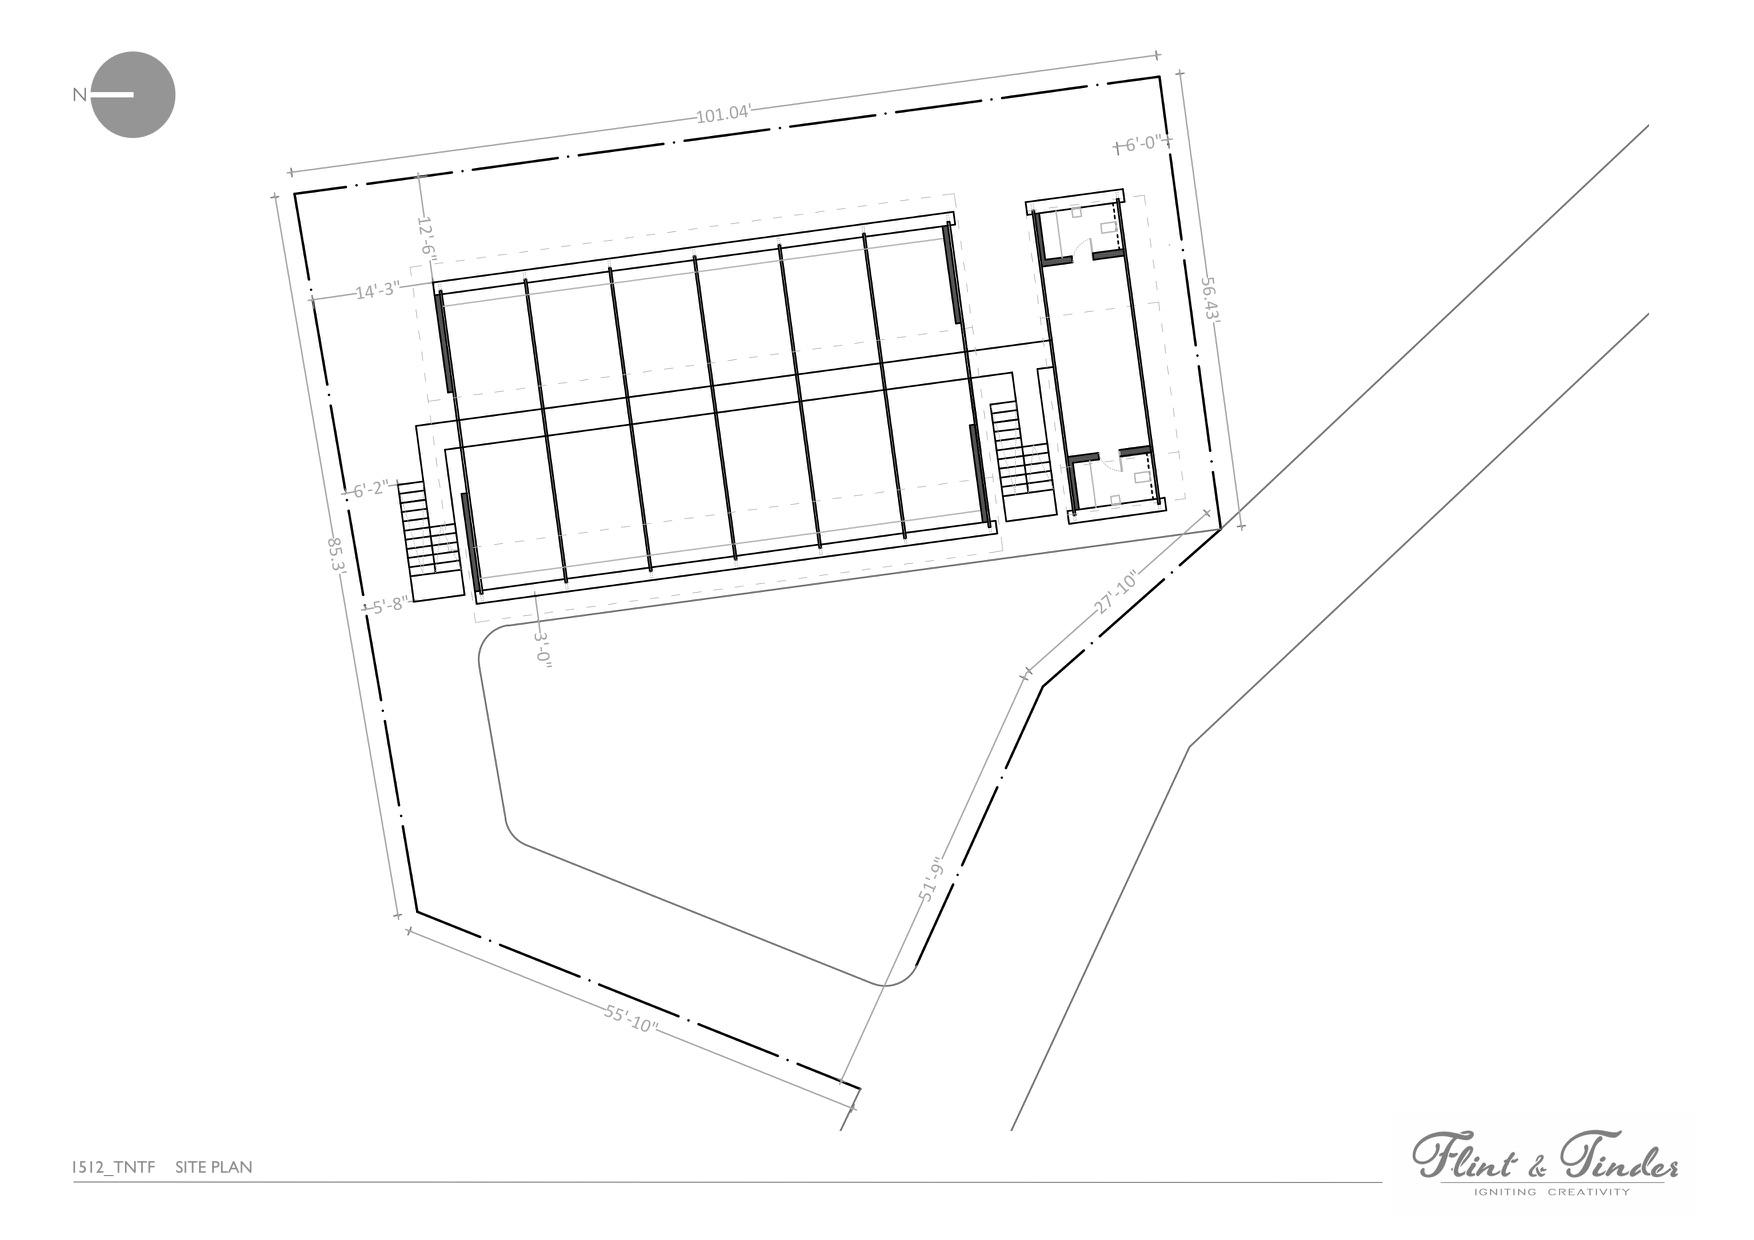 01. Site Plan